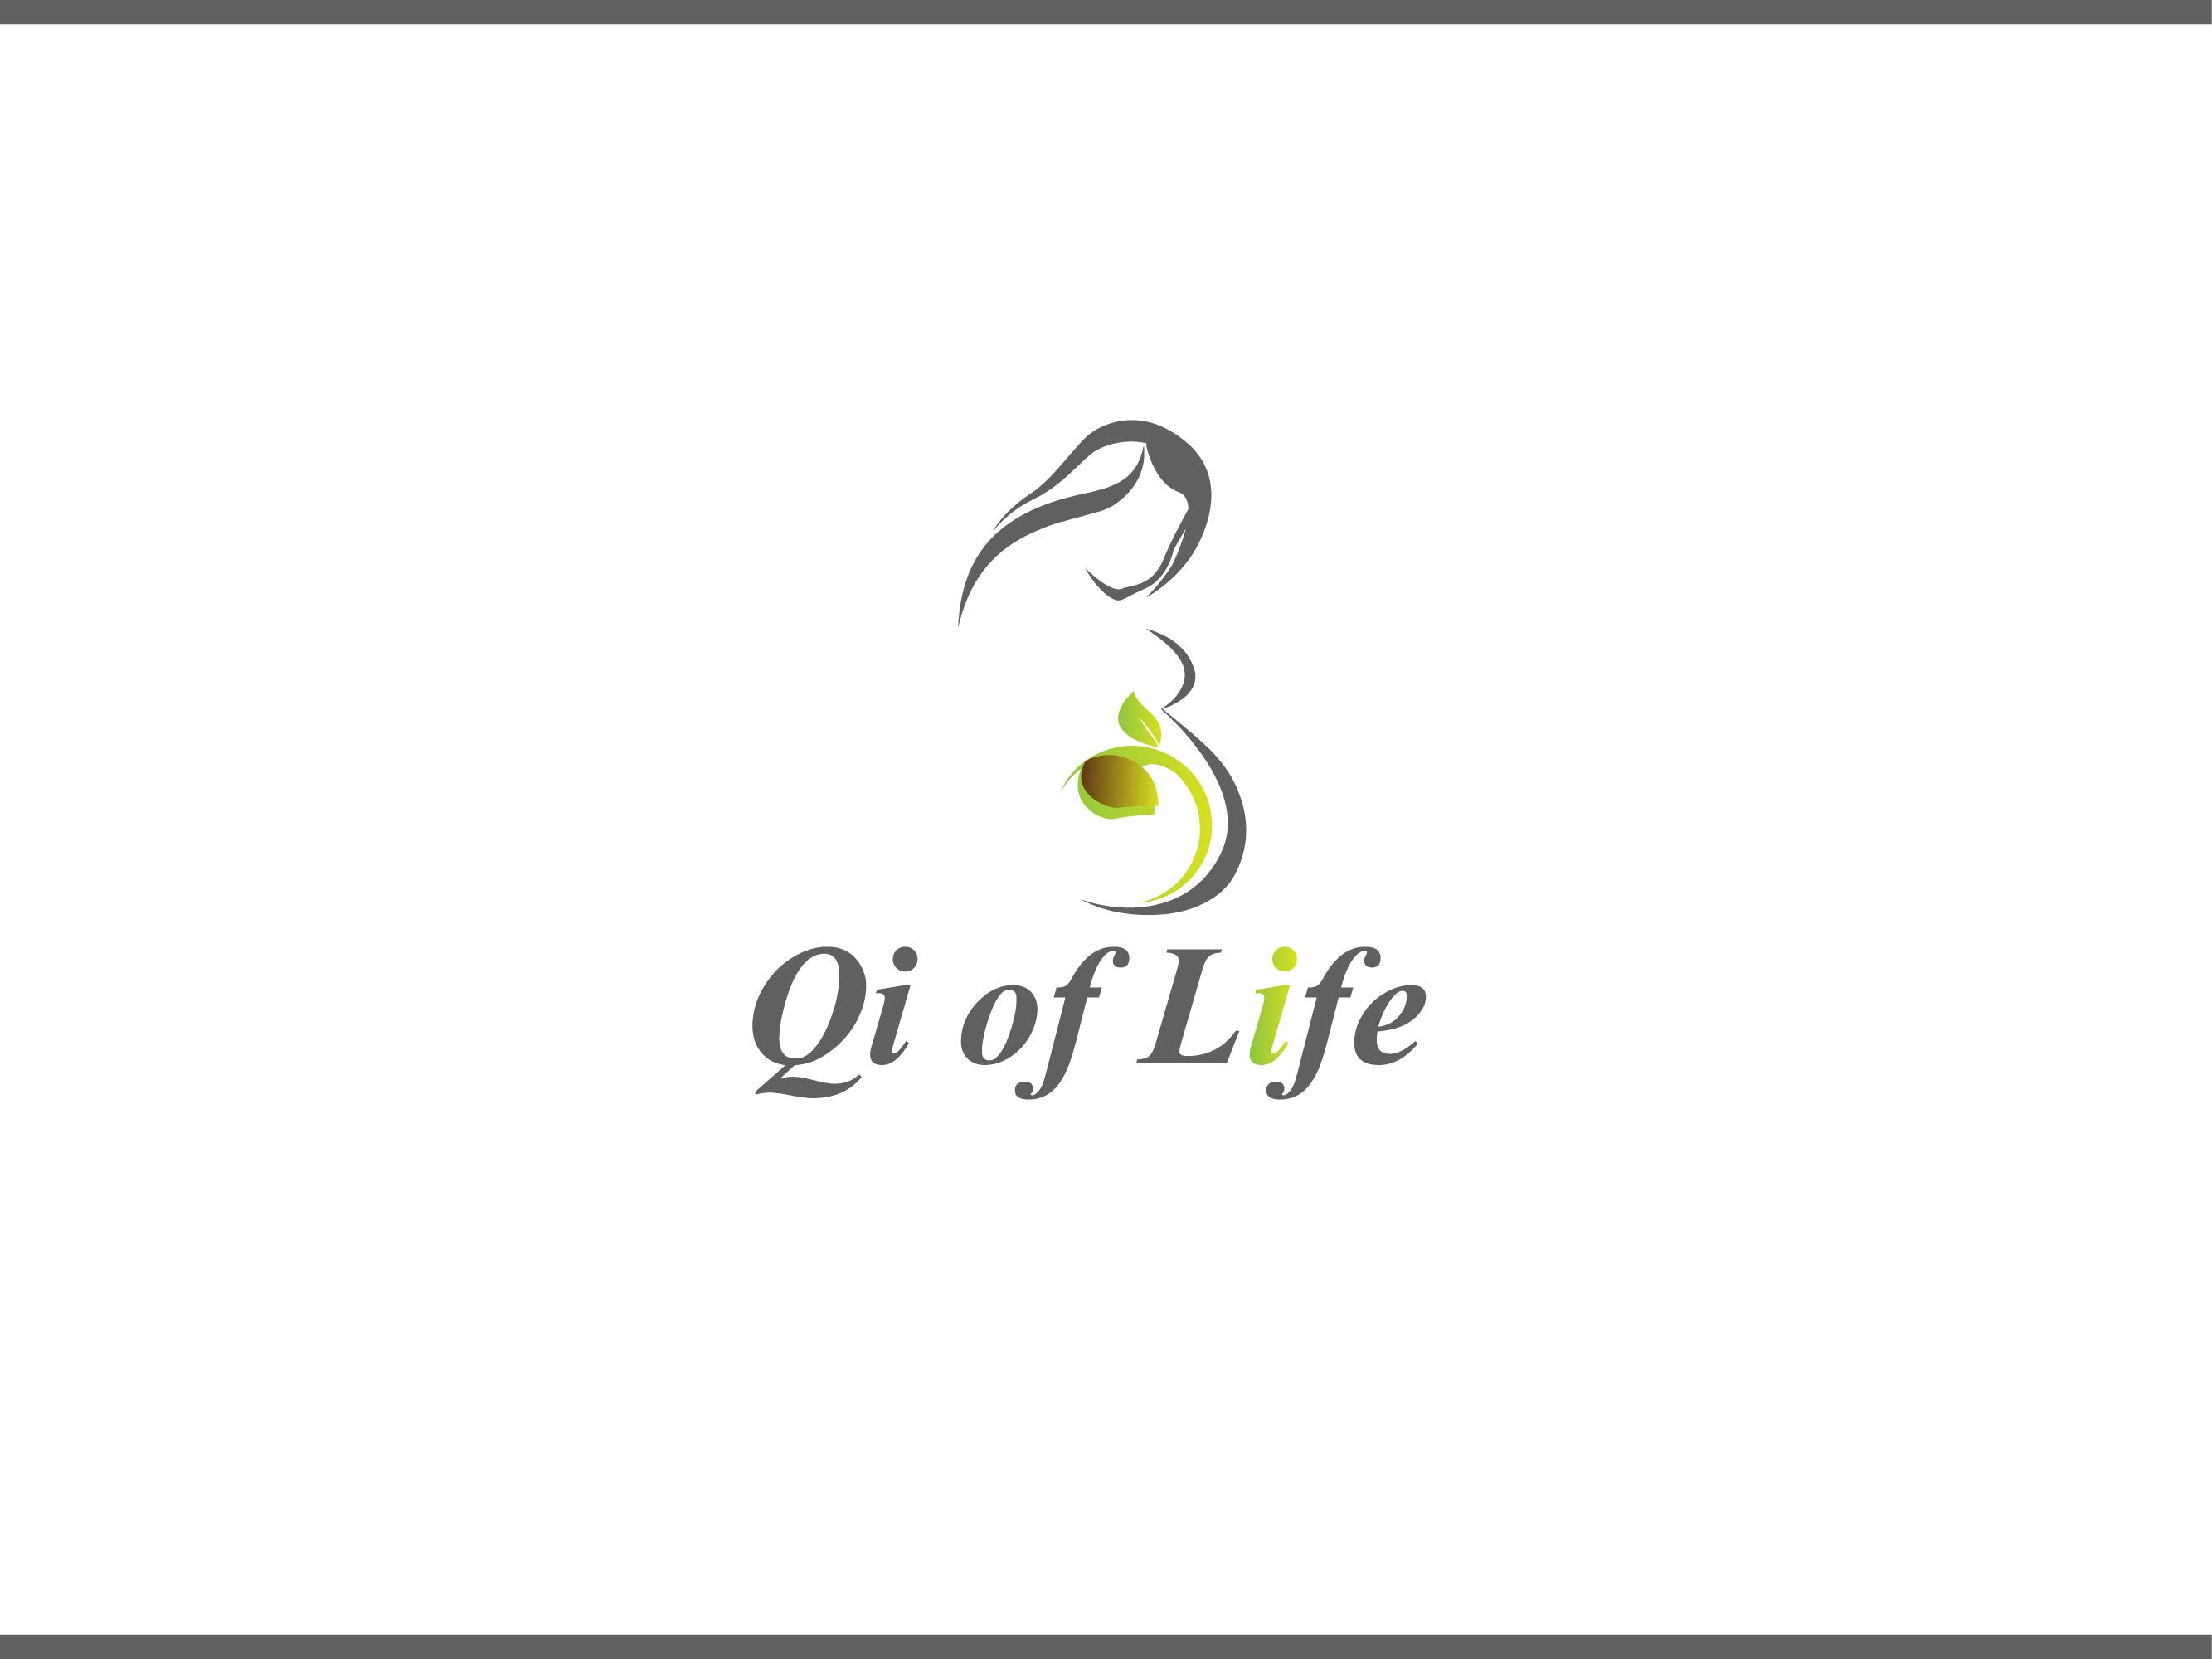 Logo Design by Allan Esclamado - Entry No. 19 in the Logo Design Contest Fun Logo Design for Qi of Life.